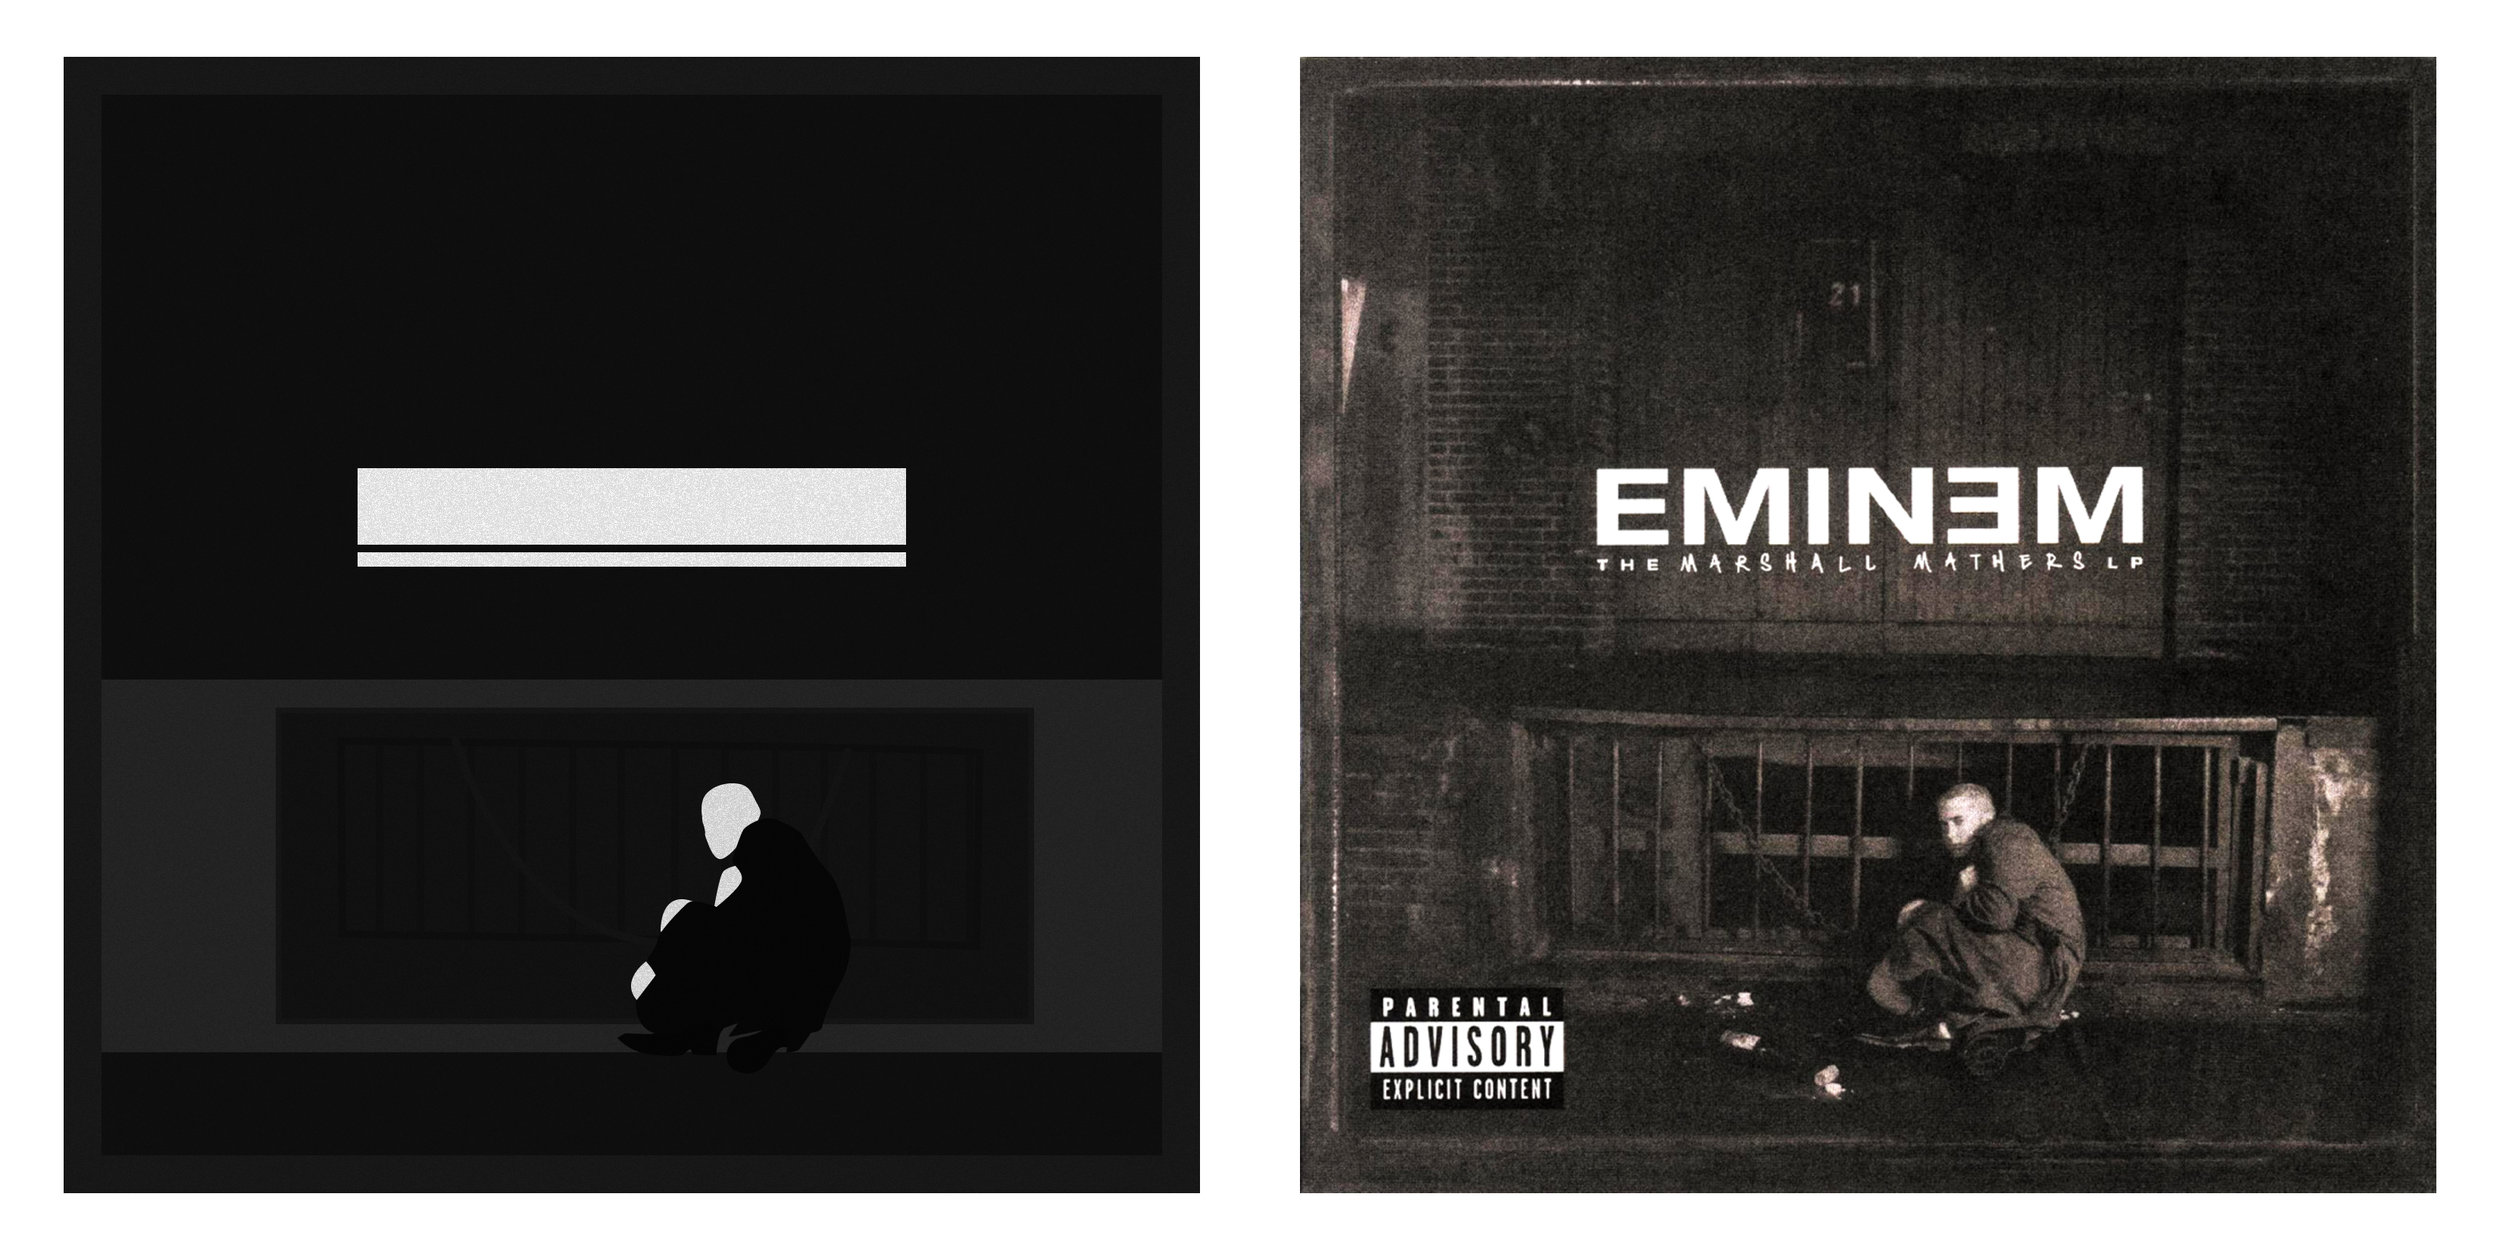 Eminem -  The Marshall Mathers LP  (2000)